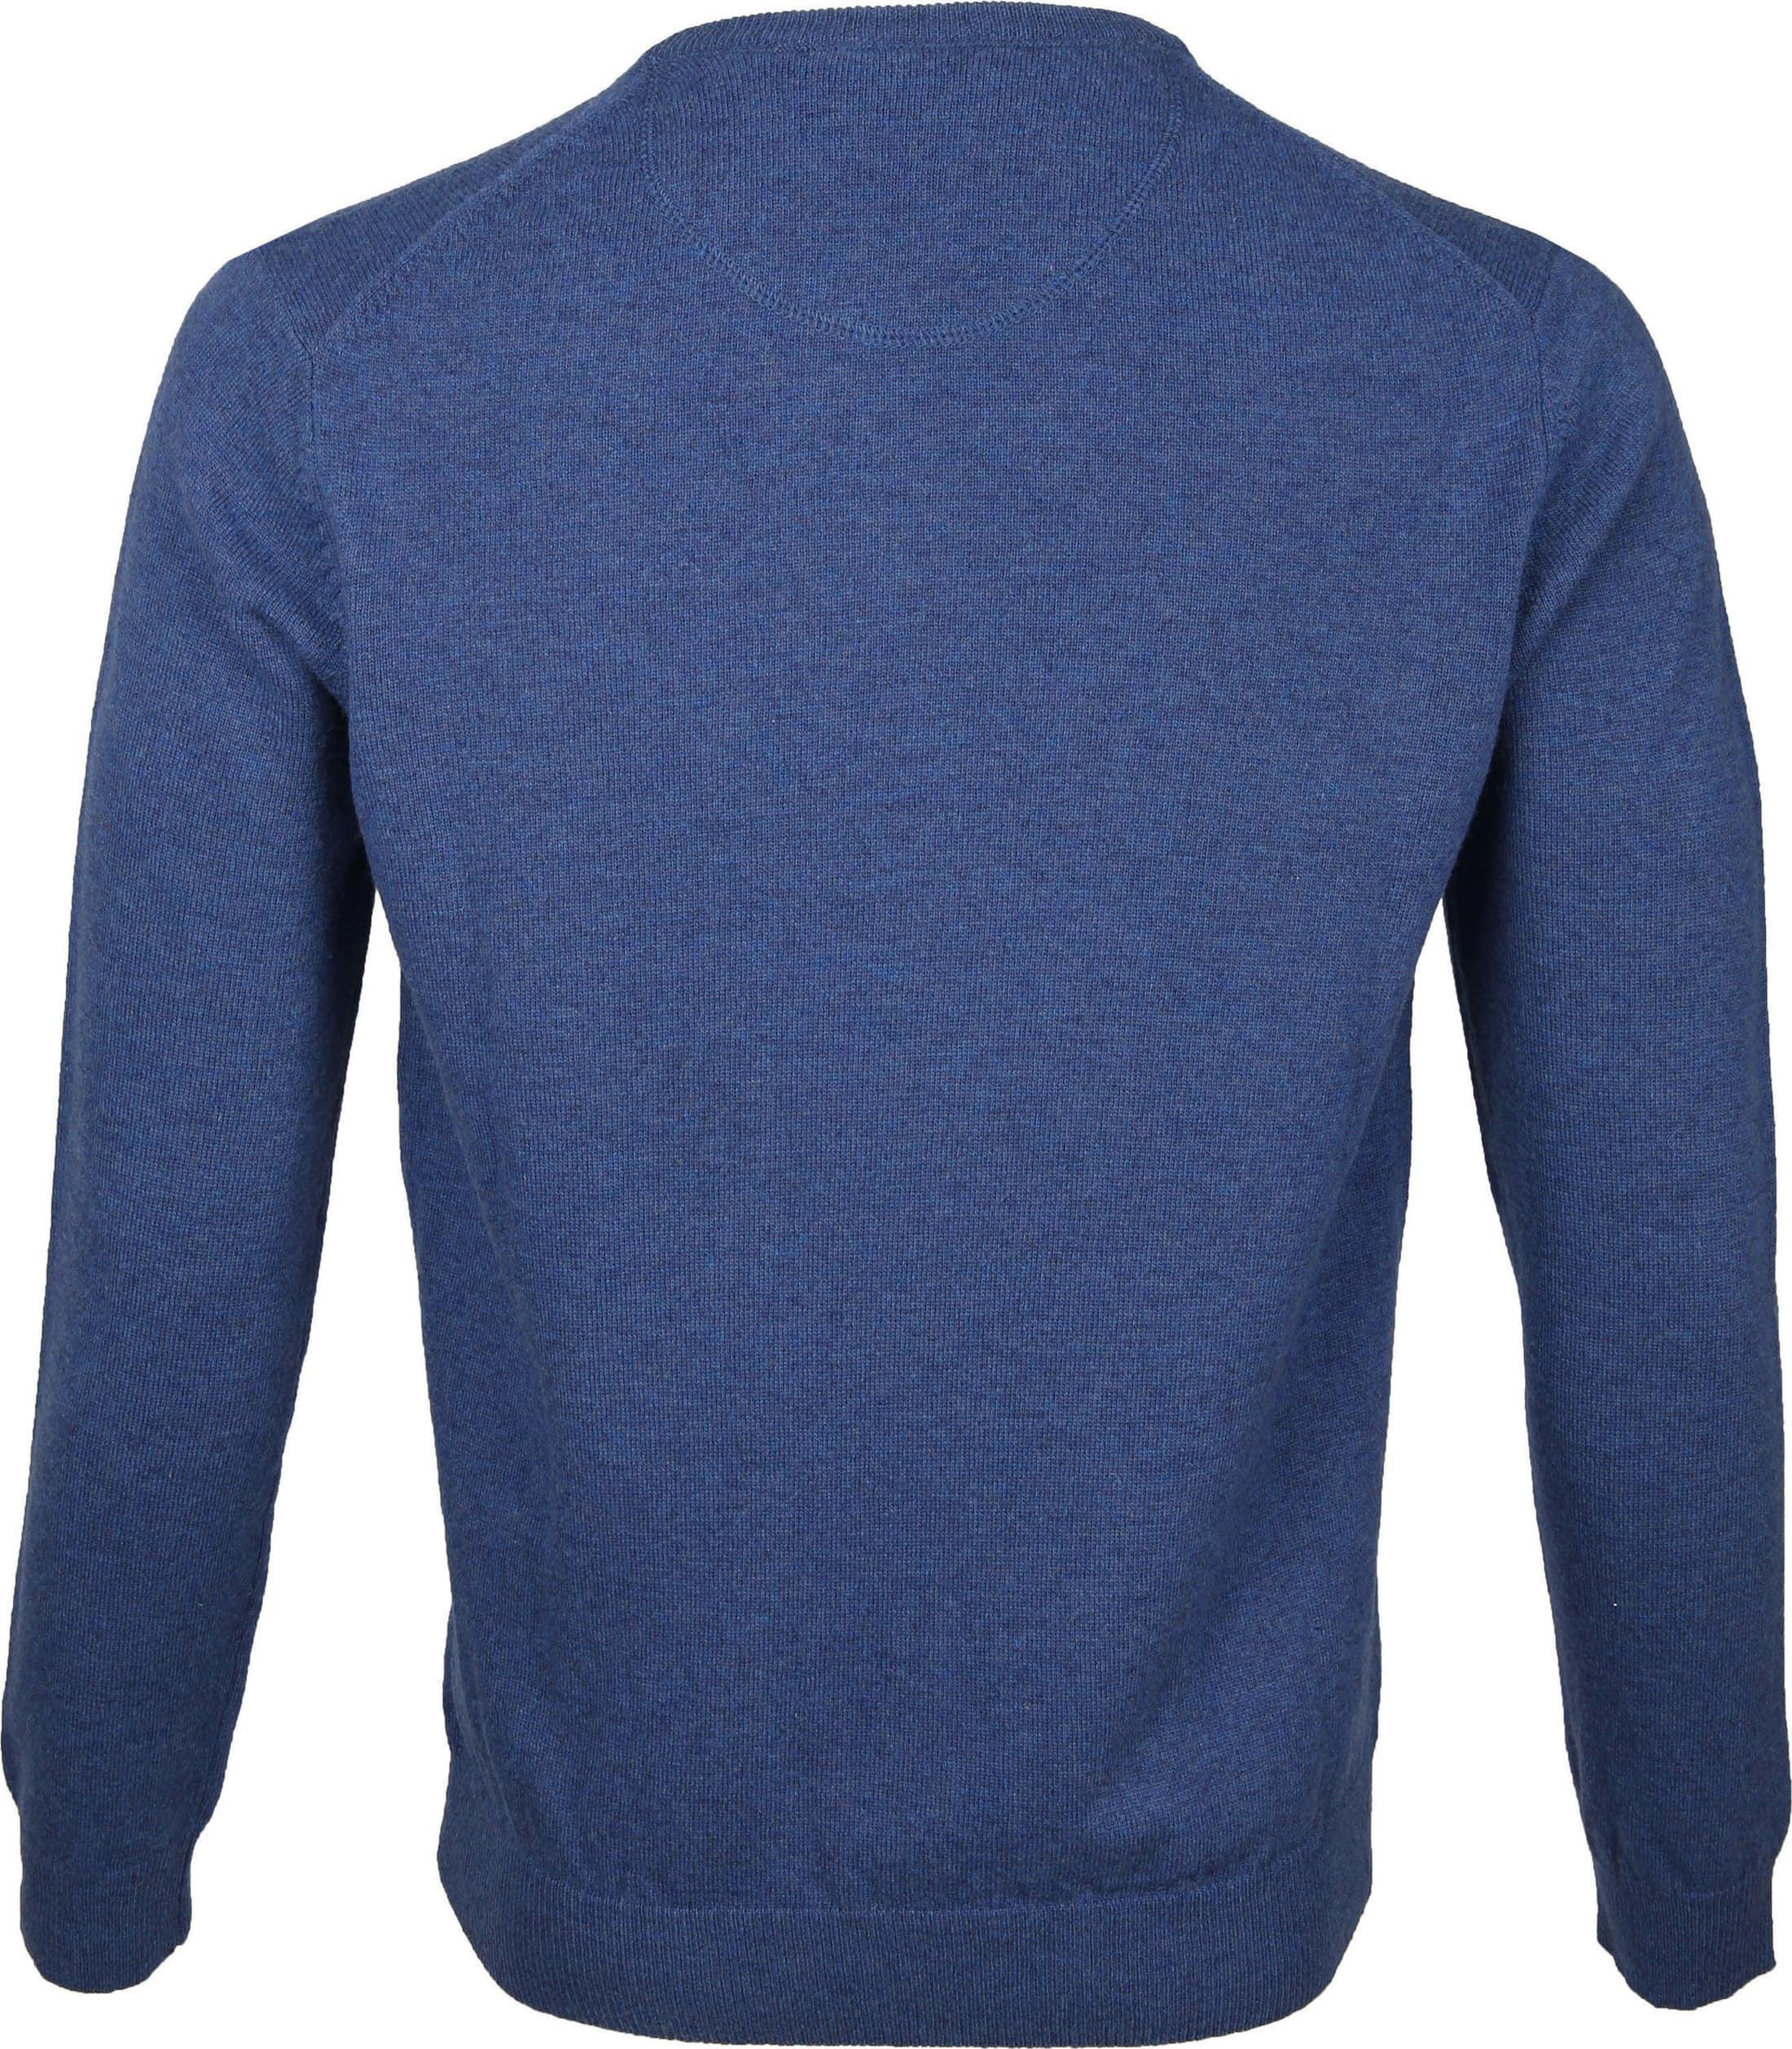 Suitable Pullover Lamswol V-Hals Blauw foto 2